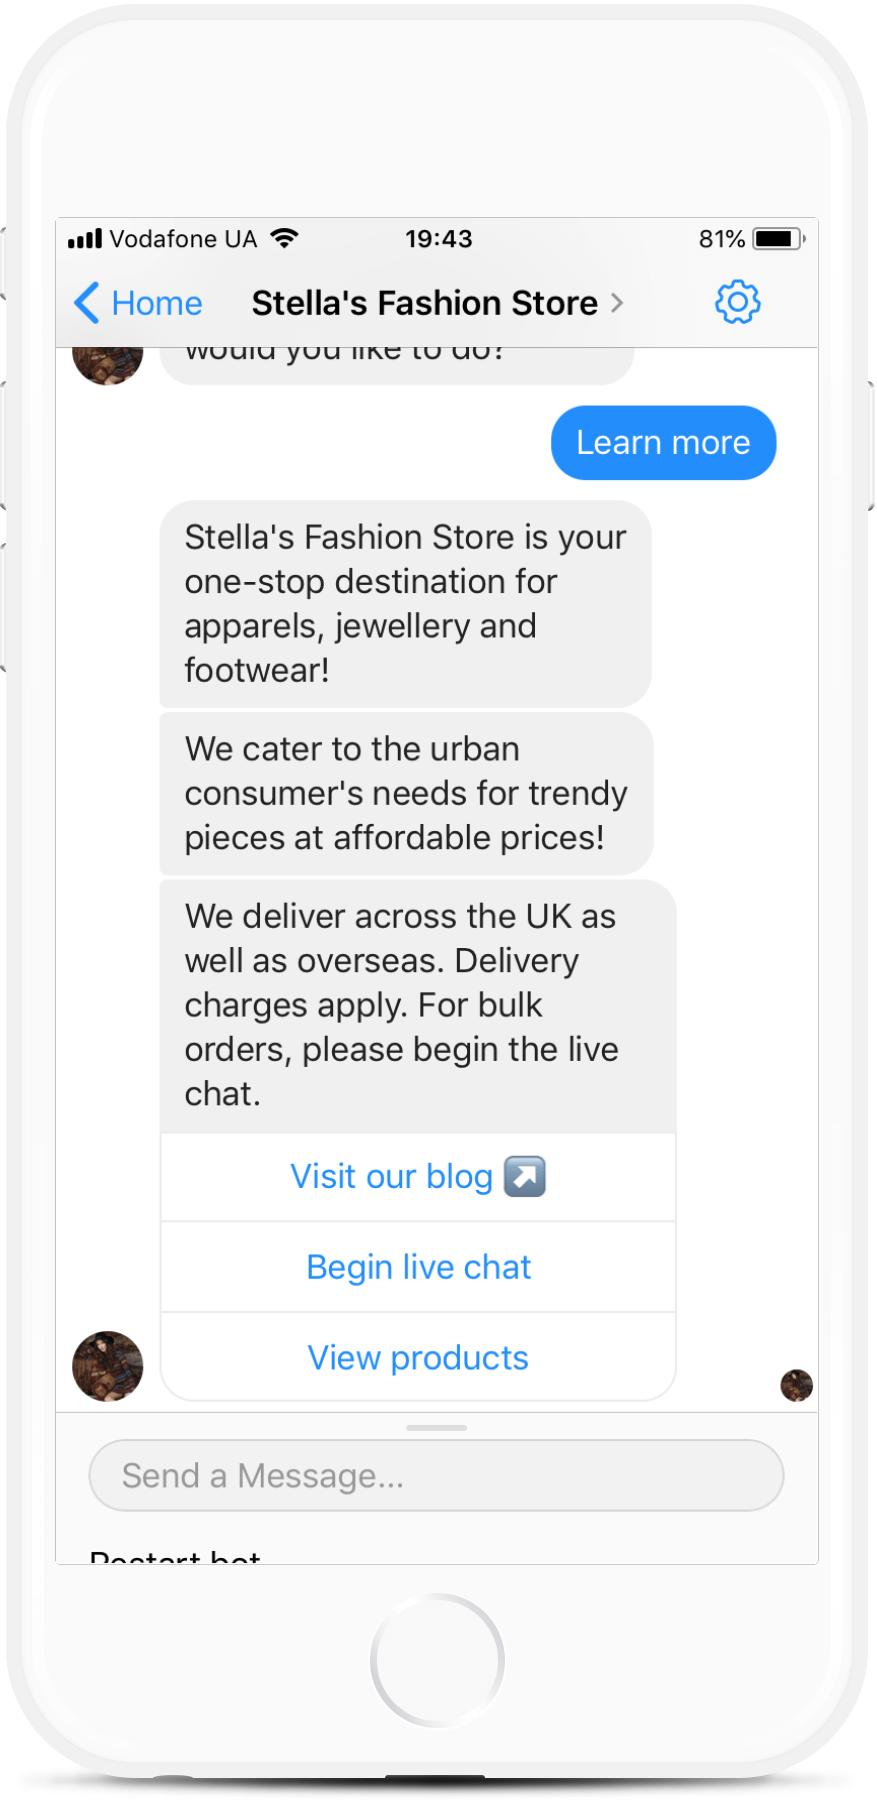 eCommerce Bot for Online Fashion Stores for $99   #messenger #bottemplates #bots #chatbots #aibots #fbmessenger #botmakers